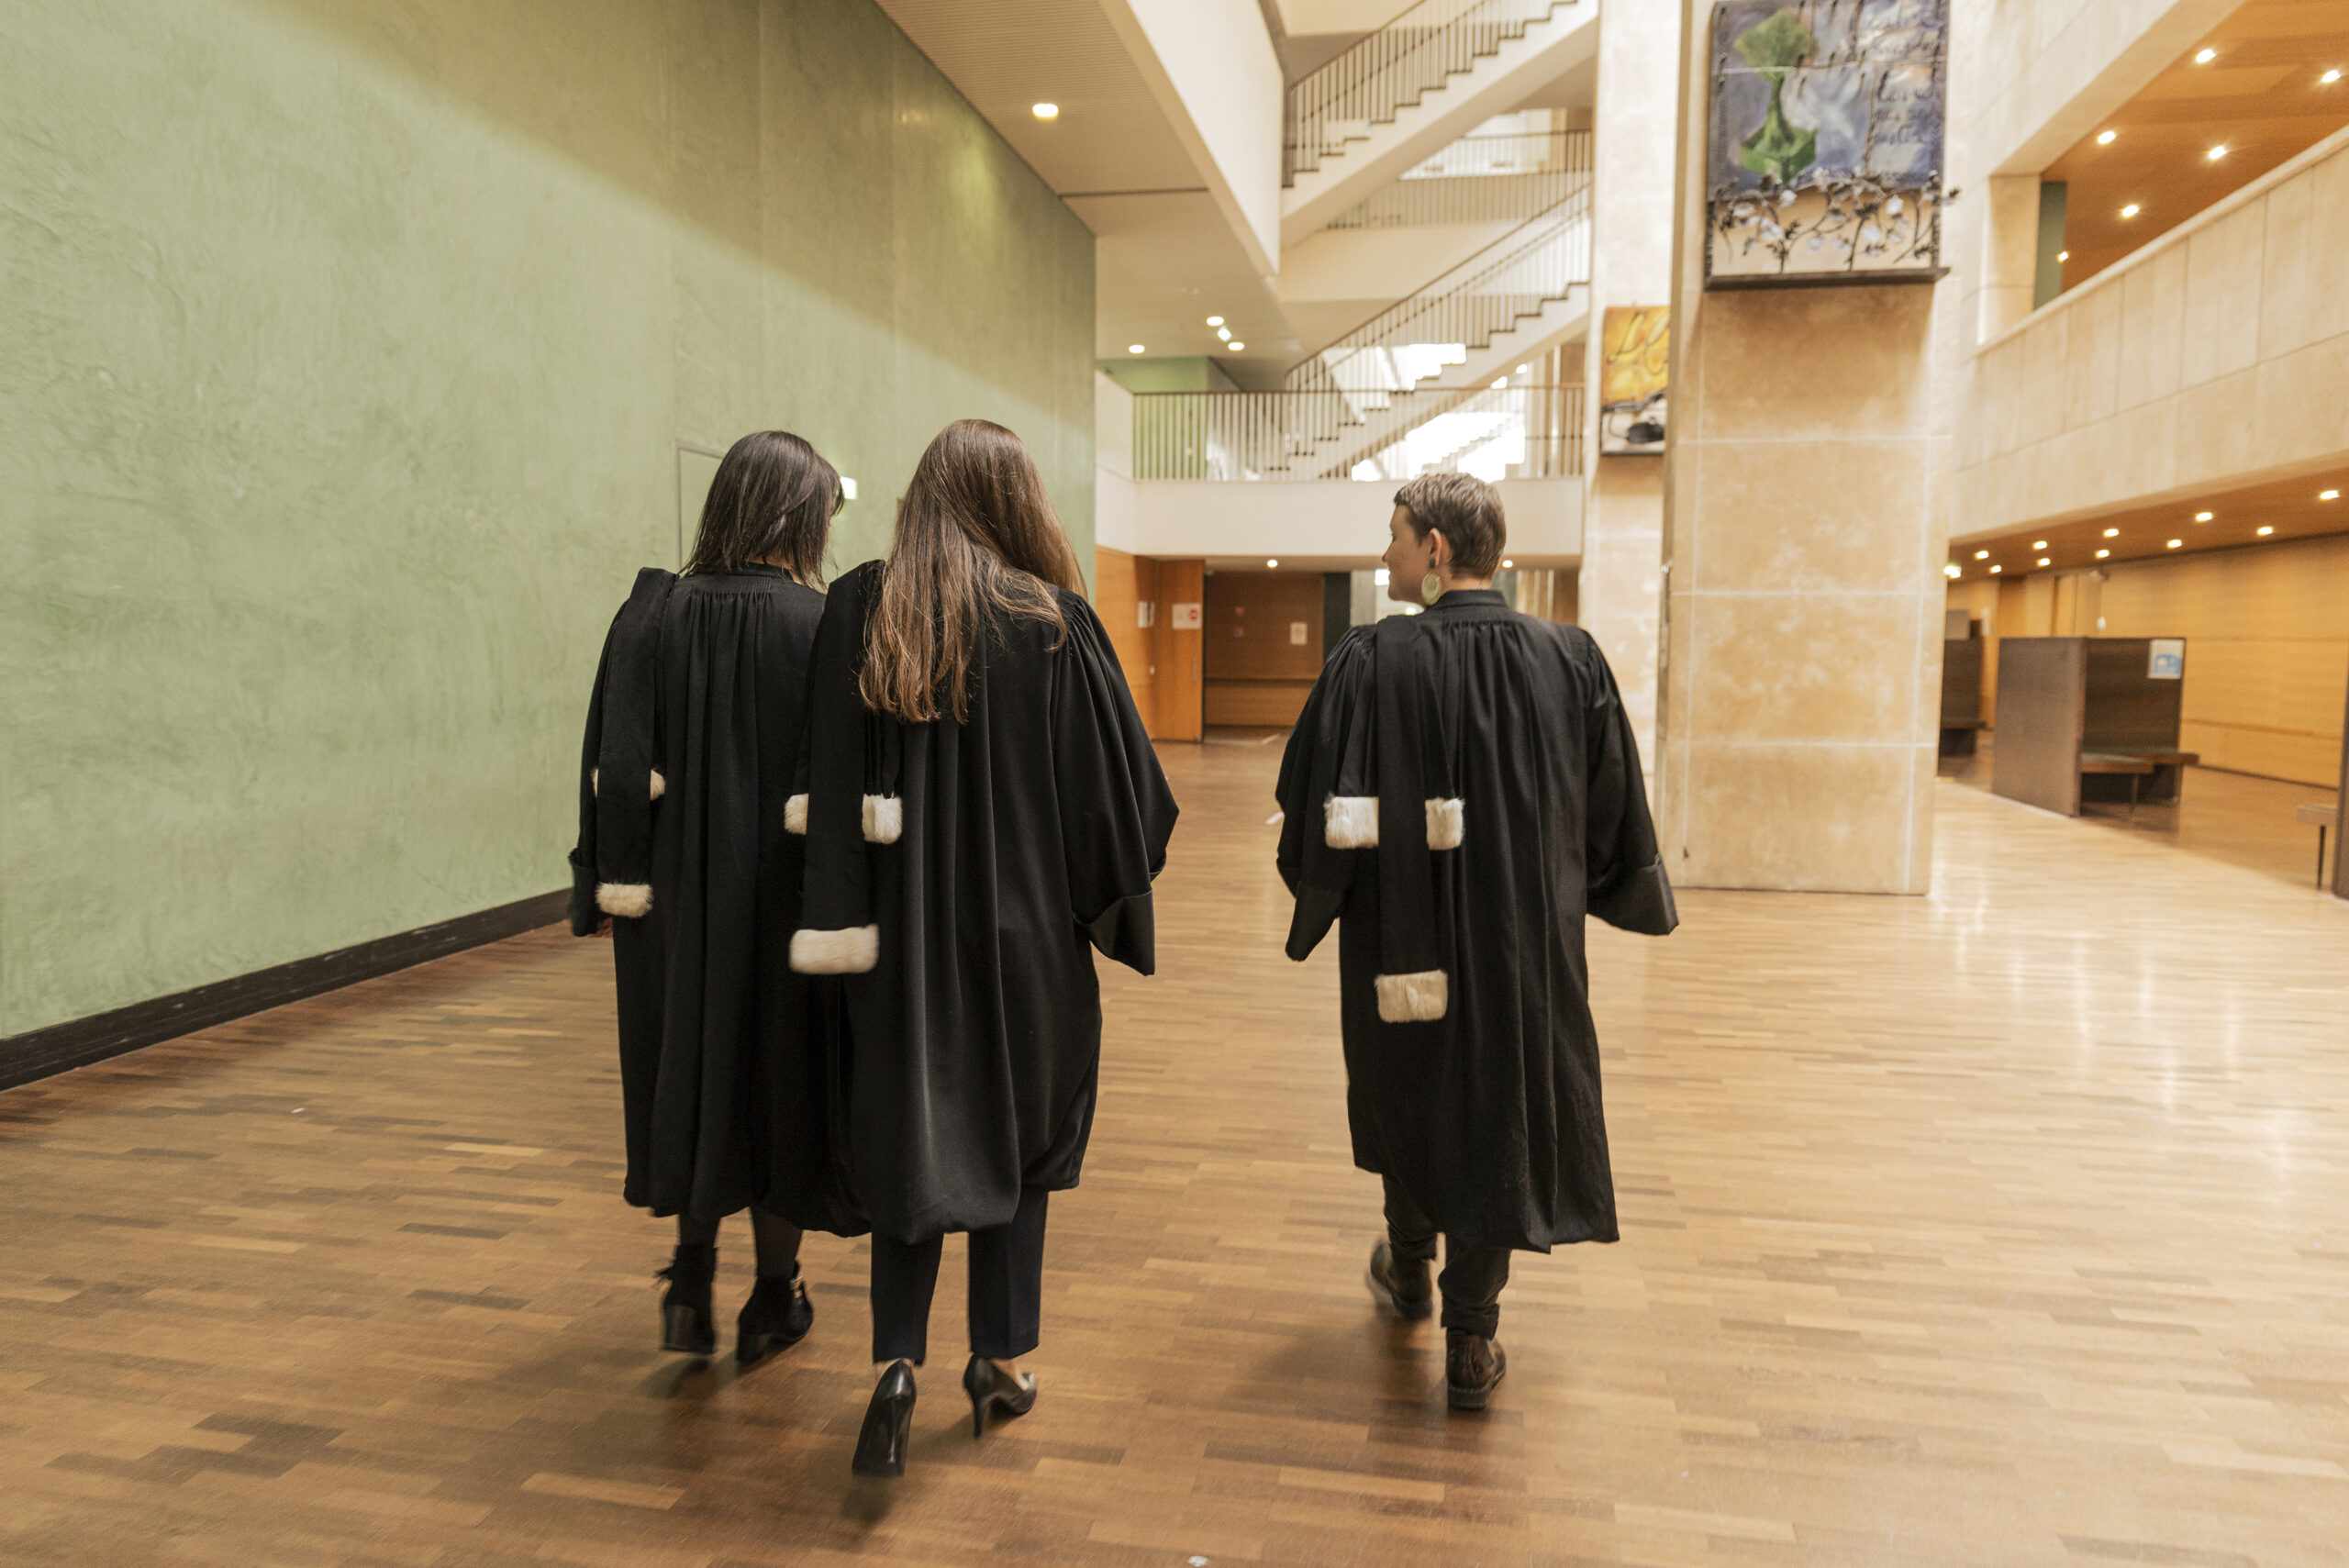 Trois avocats en robe discutent dans le Tribunal Lyon